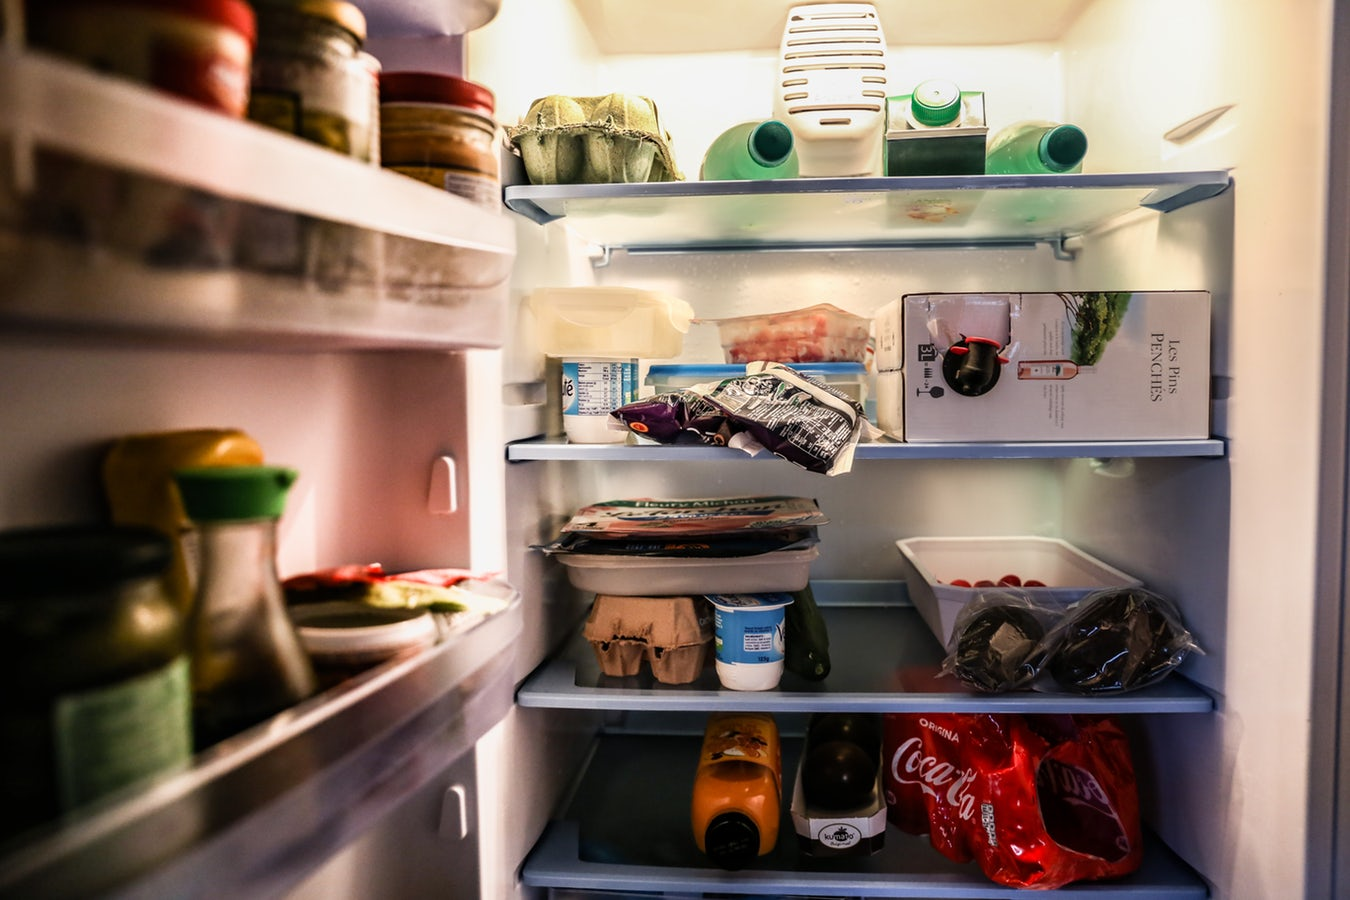 fridge-freezer-organization-featured.jpg